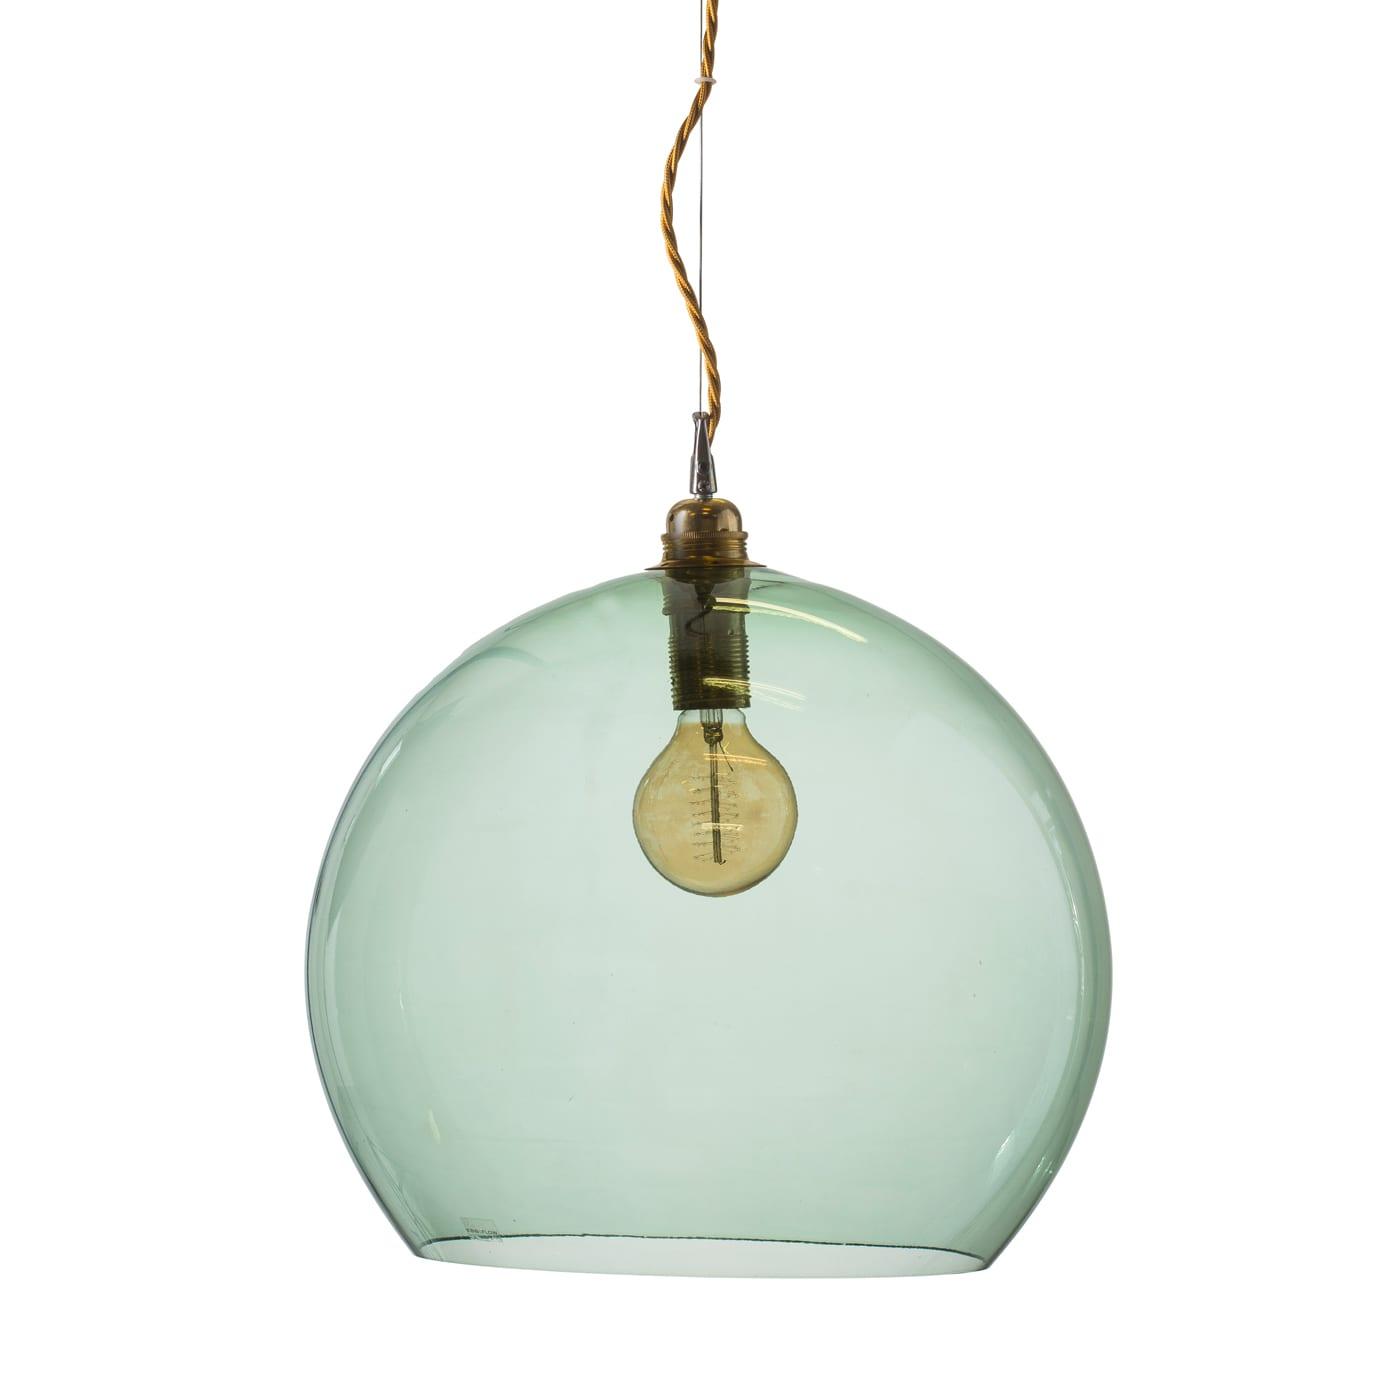 Rowan pendant lamp, forest green, 39cm